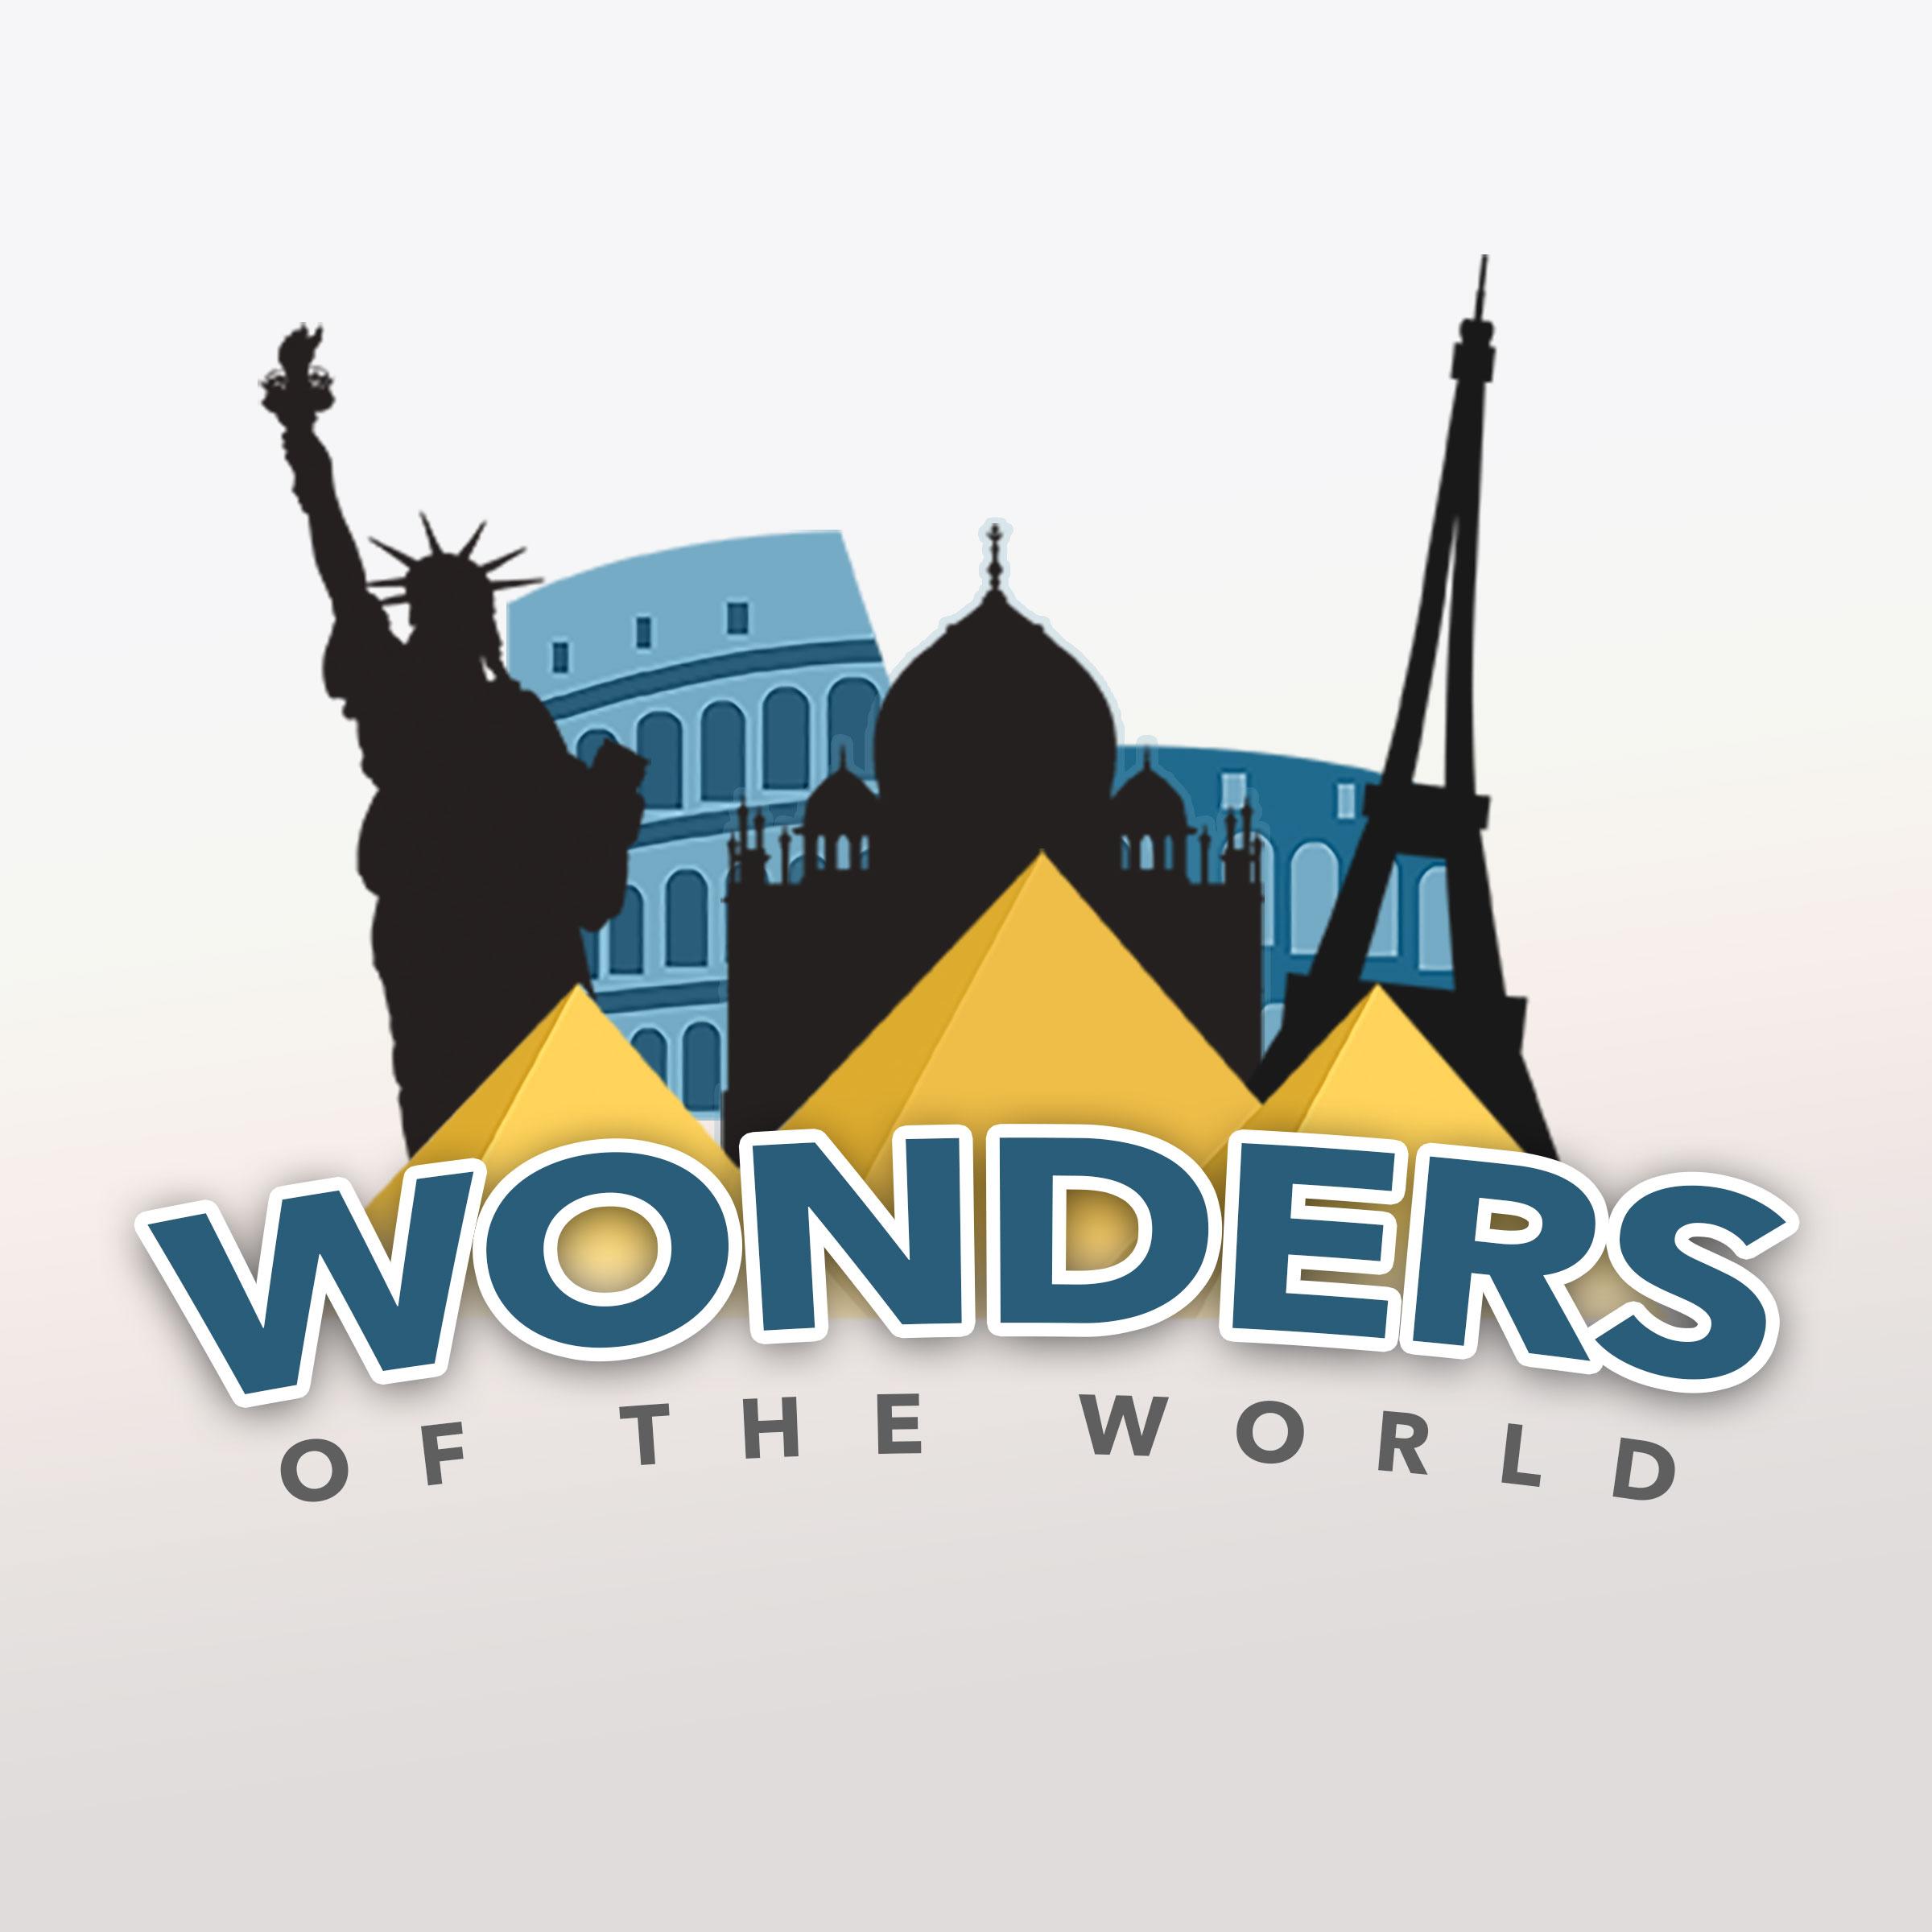 Wonders of the World show art